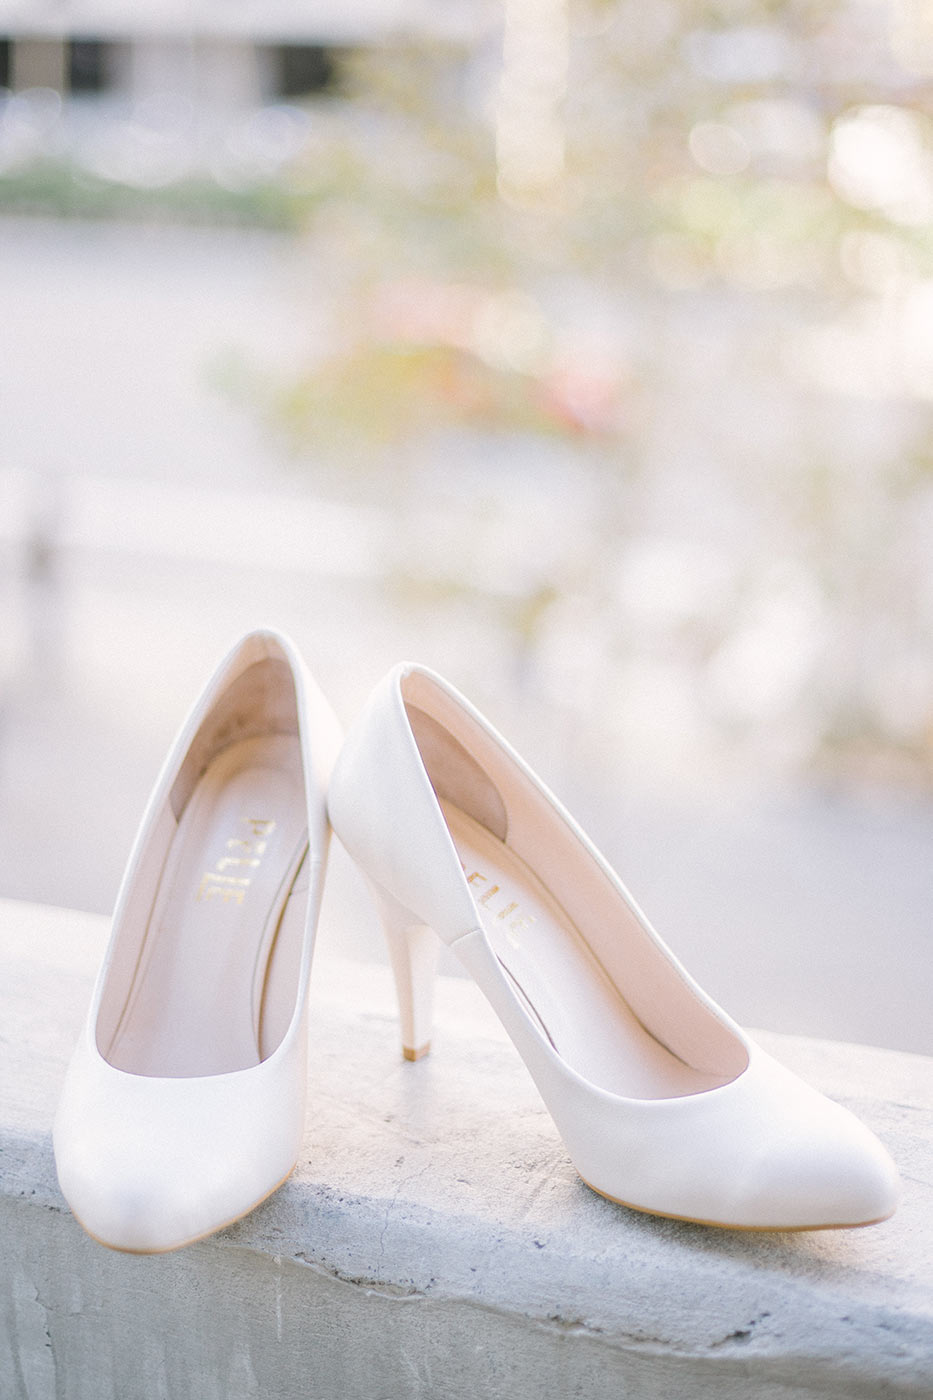 Bride's shoes | Fine Art Photographer | Lena Karelova Photography | Destination Wedding Photographer Barcelona |Film Wedding Photographer